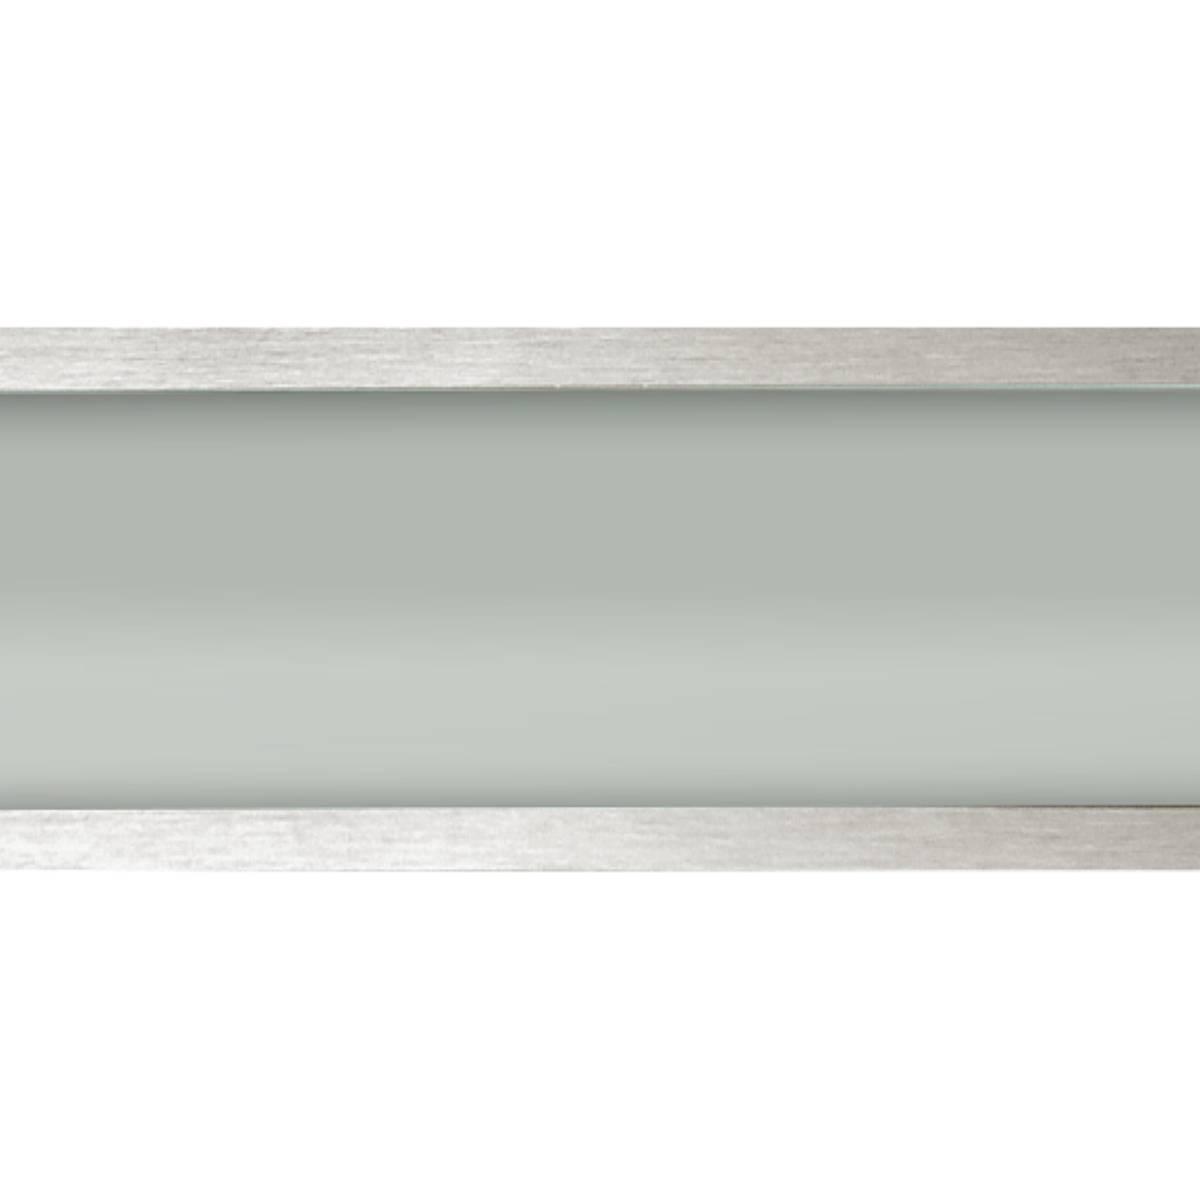 Plafon Space Emb. Ret.   35cm Alum. Vidro Fosco E-27 2 Lamp. Max 60w Branco 05 Unidades